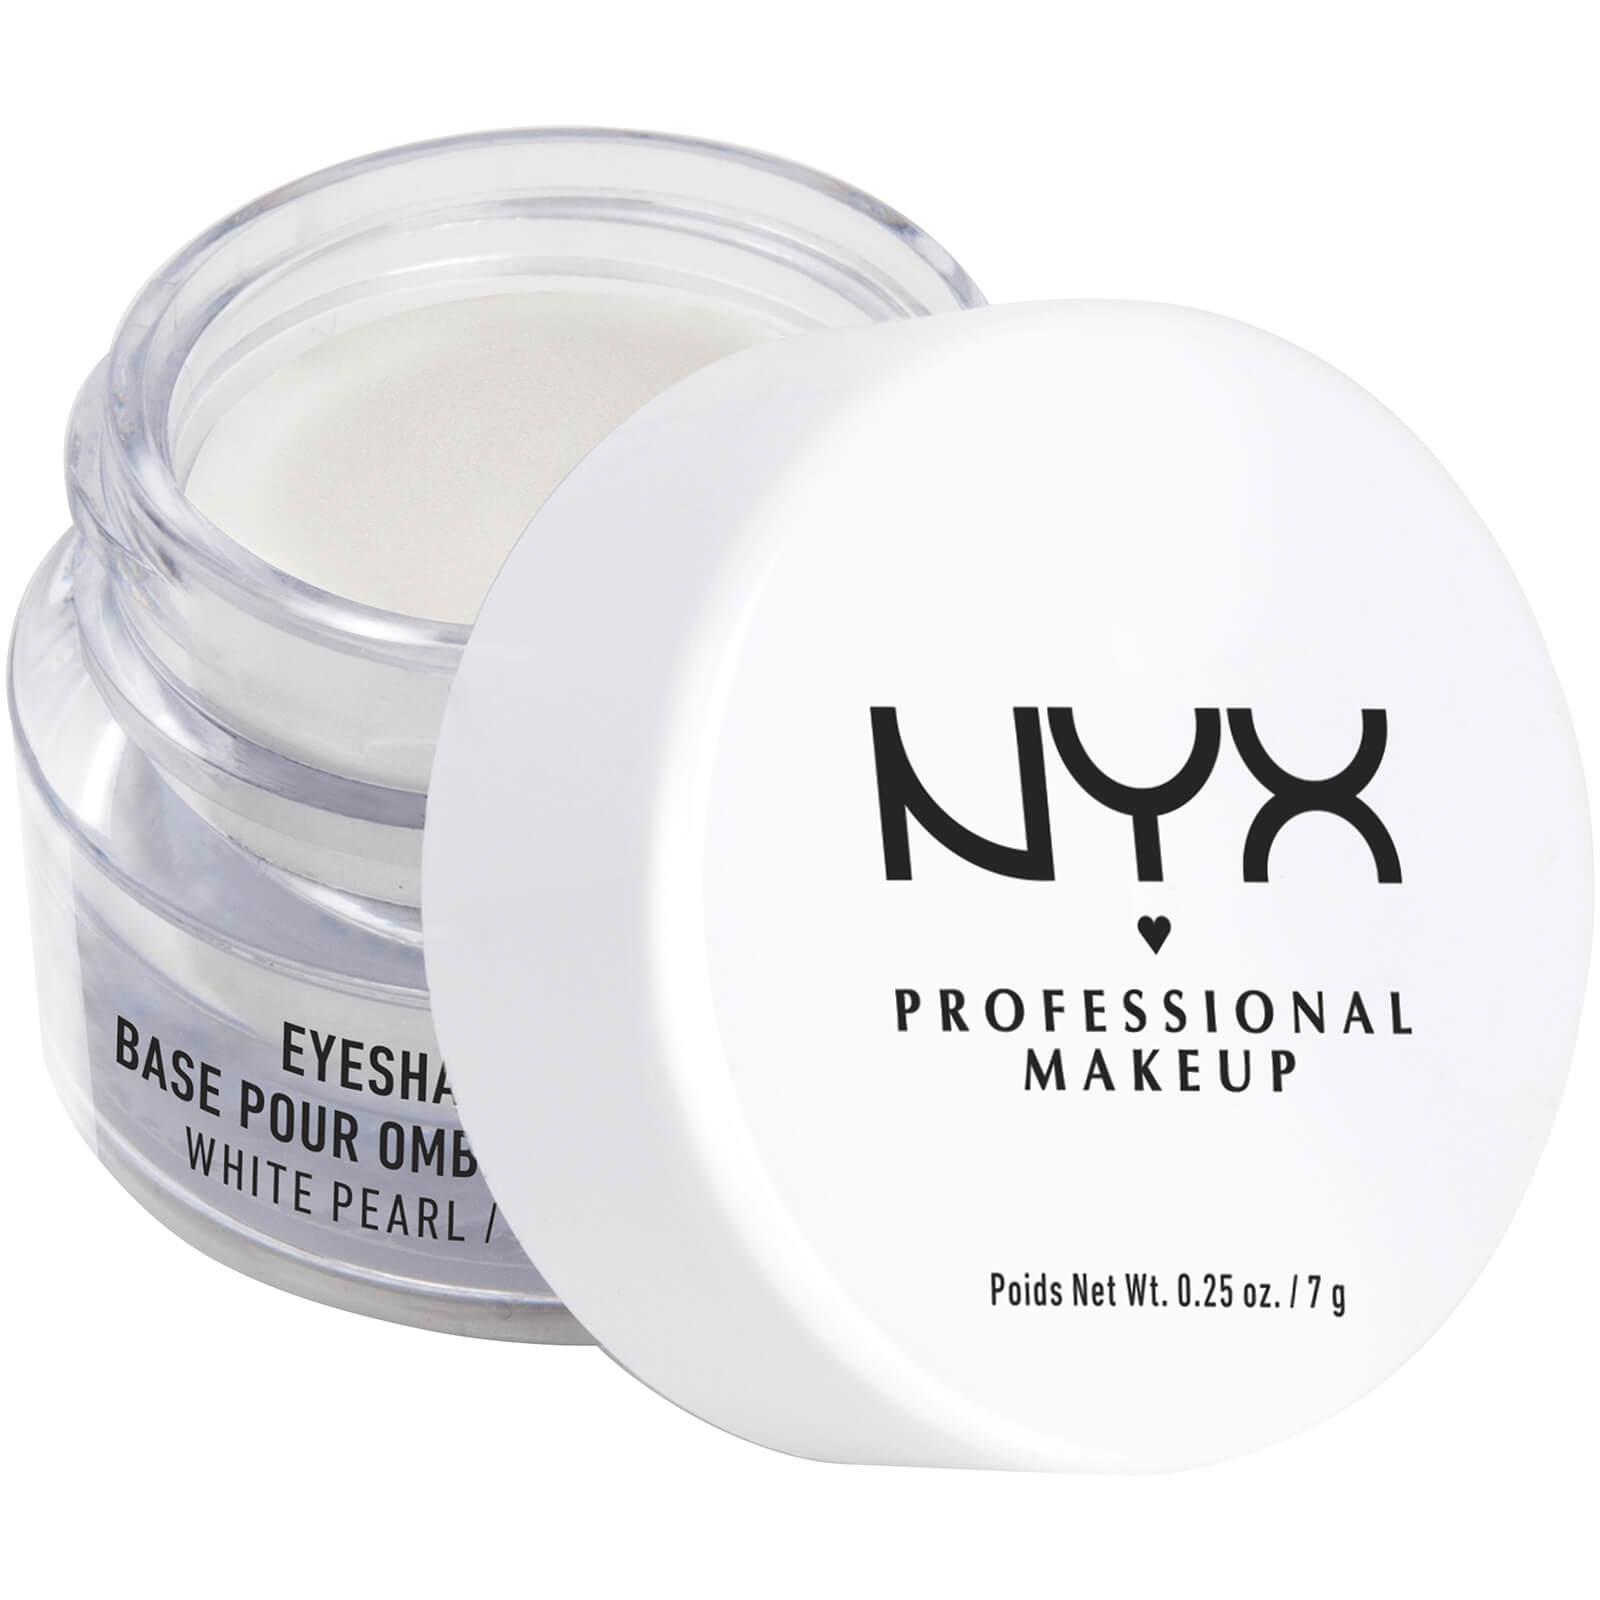 Купить Основа для теней NYX Professional Makeup Eye Shadow Base (различные оттенки) - White Pearl